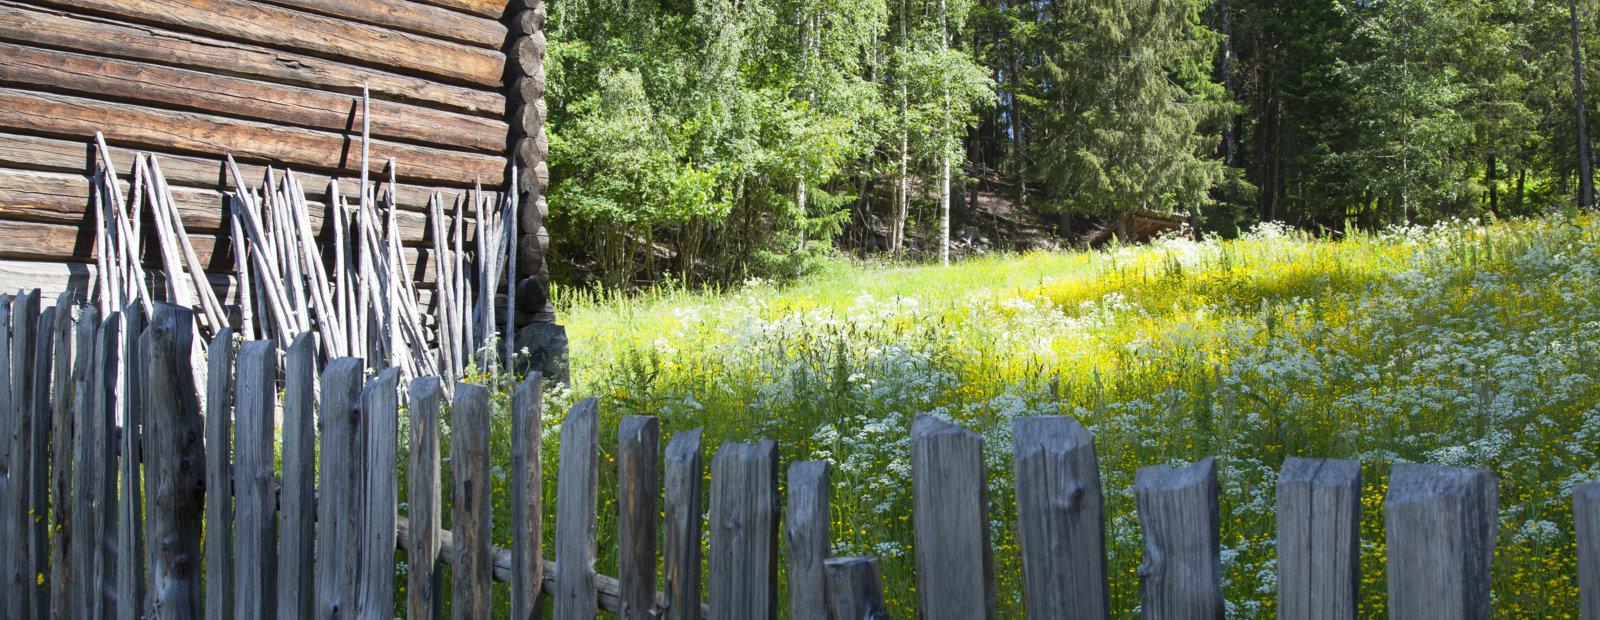 Maihaugen, Lillehammer